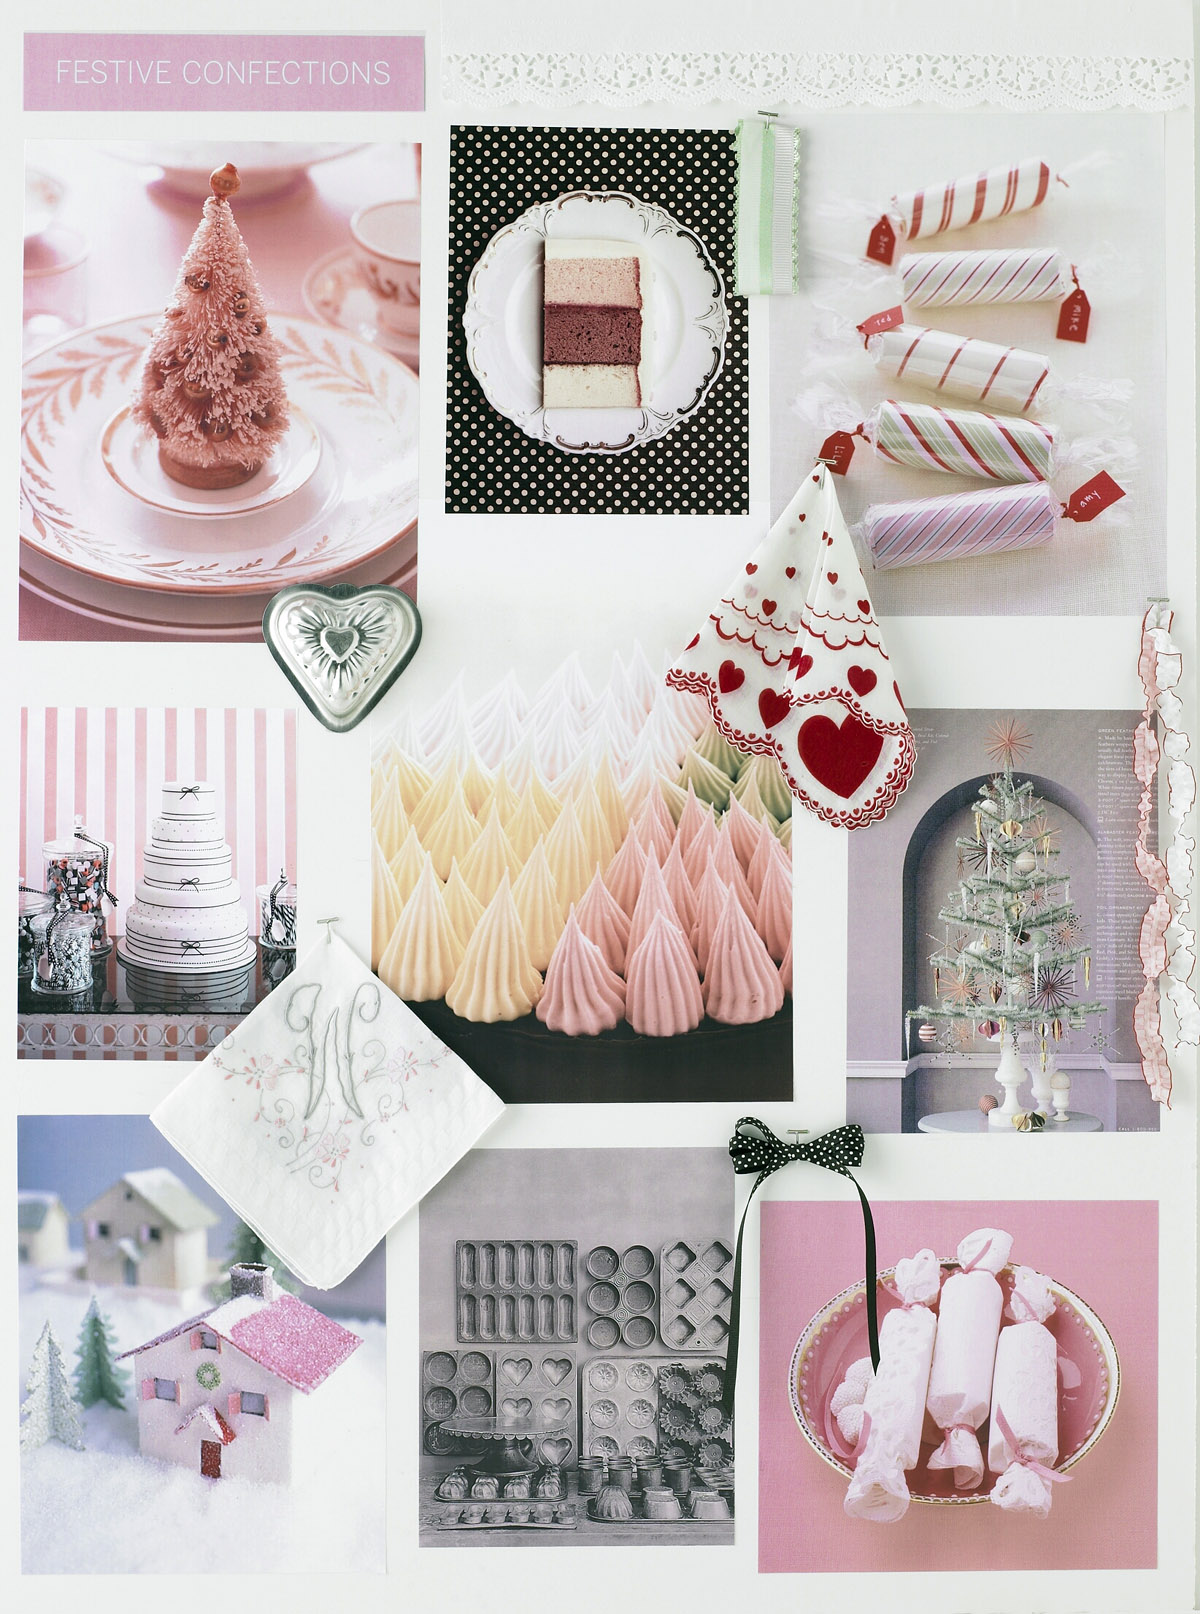 festive_confections board.jpg